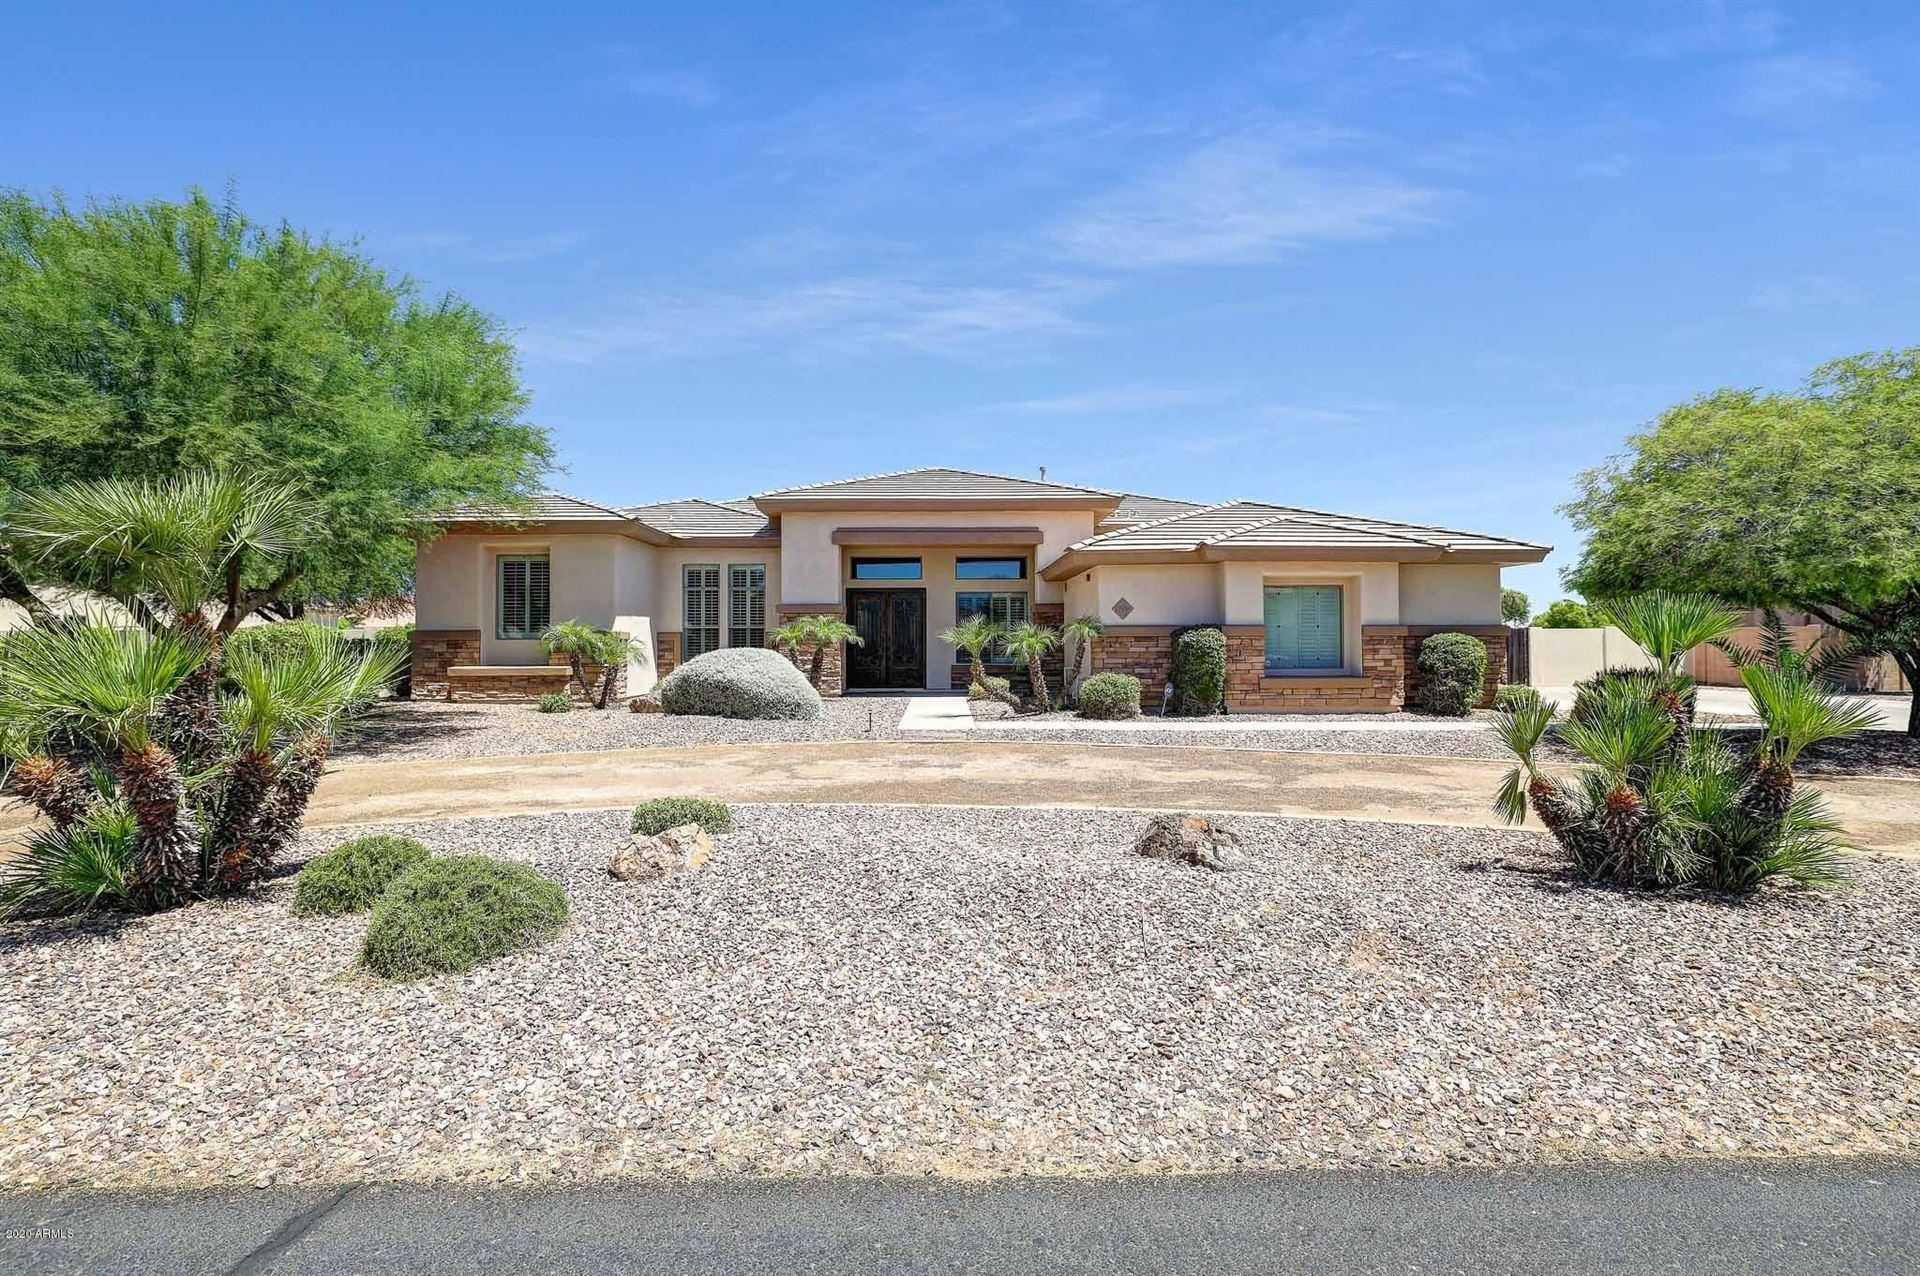 17934 W DENTON Avenue, Litchfield Park, AZ 85340 - MLS#: 6093533